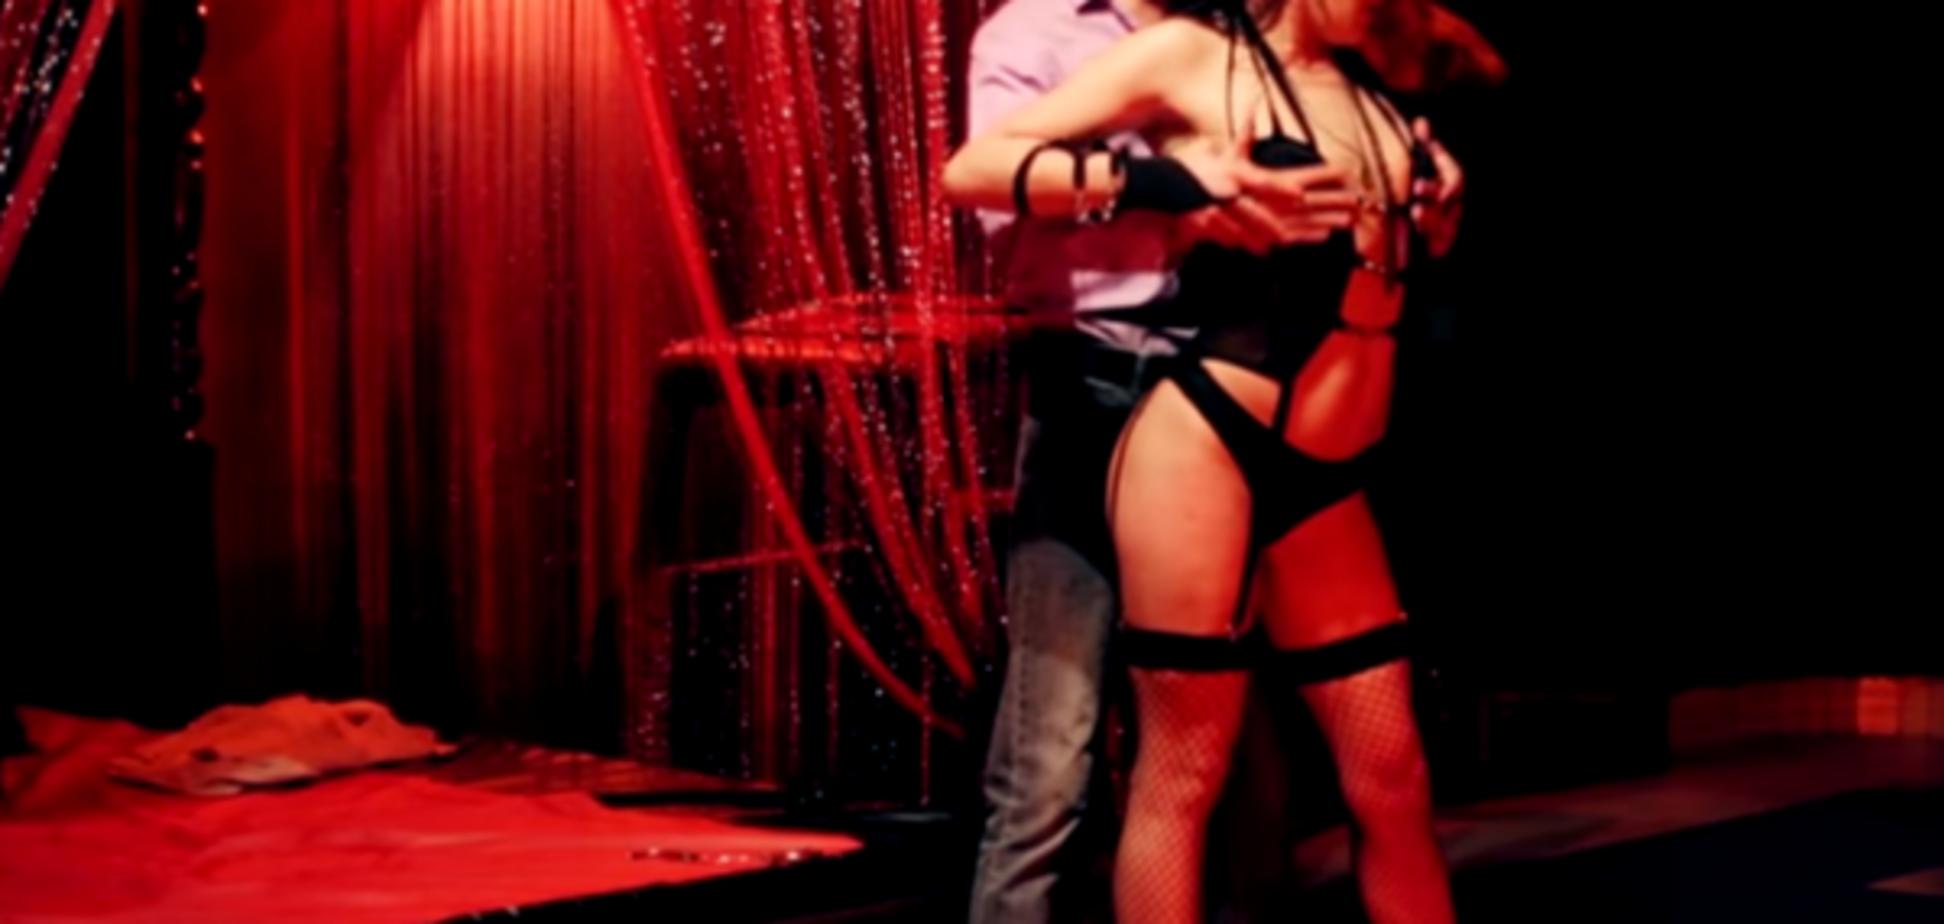 Росія шокувала трейлером еротичного фільму 'Бурятський жеребець'